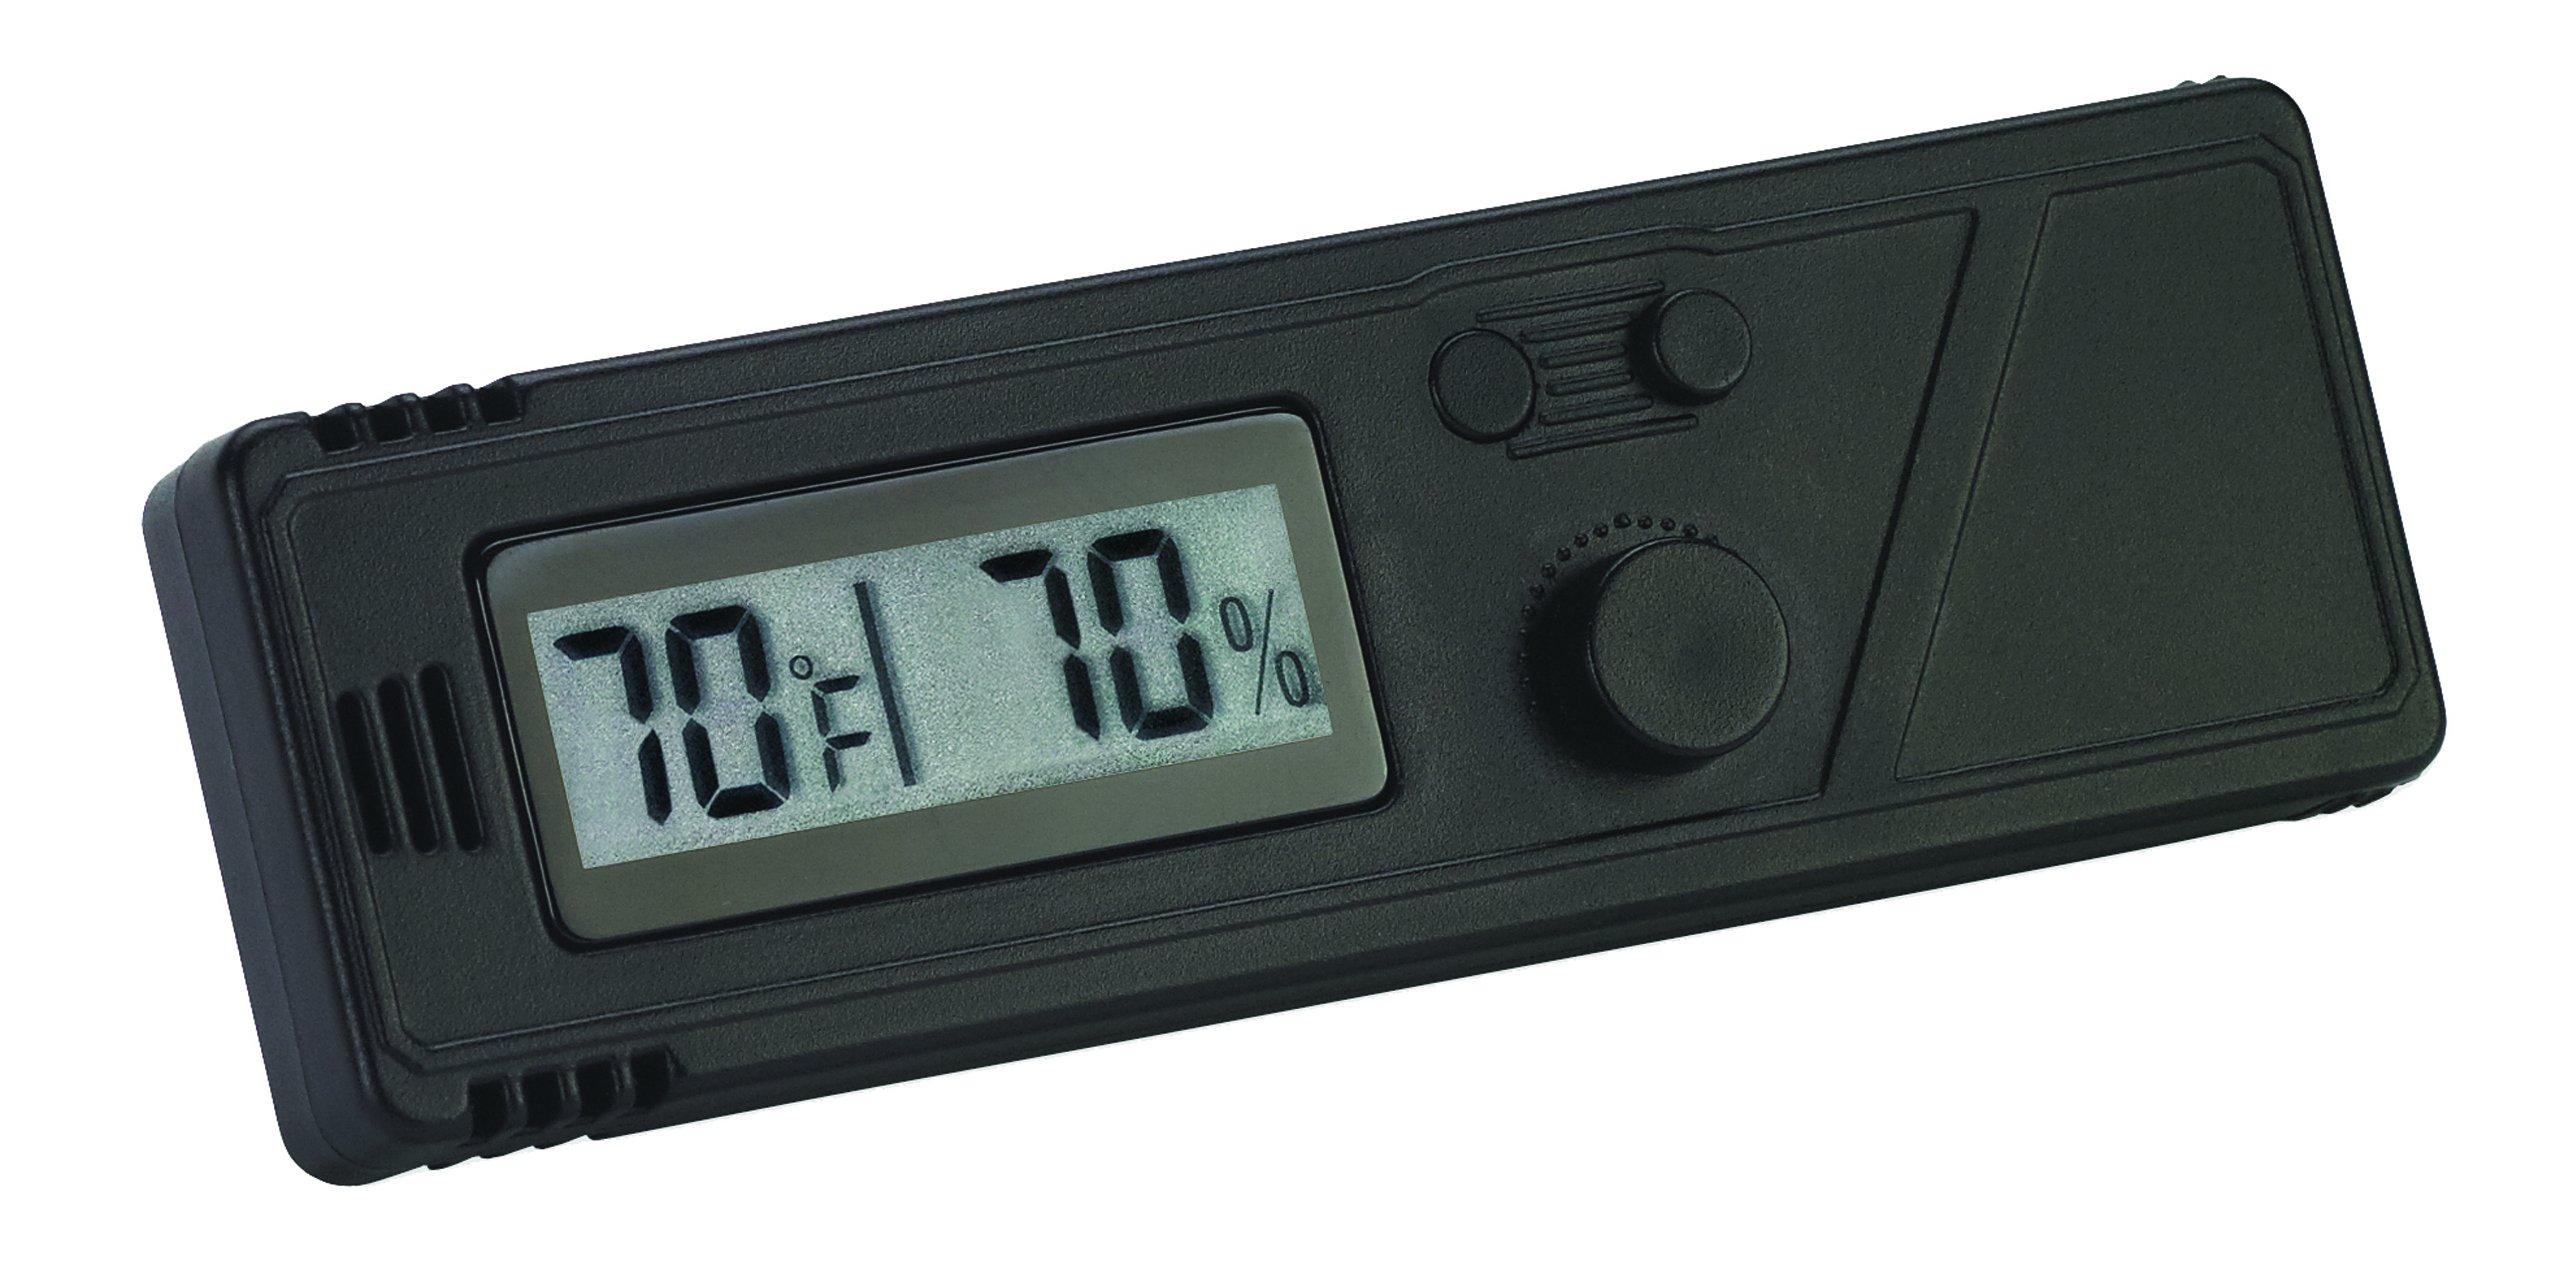 HygroSet Slim Line Digital Hygrometer by Hygroset